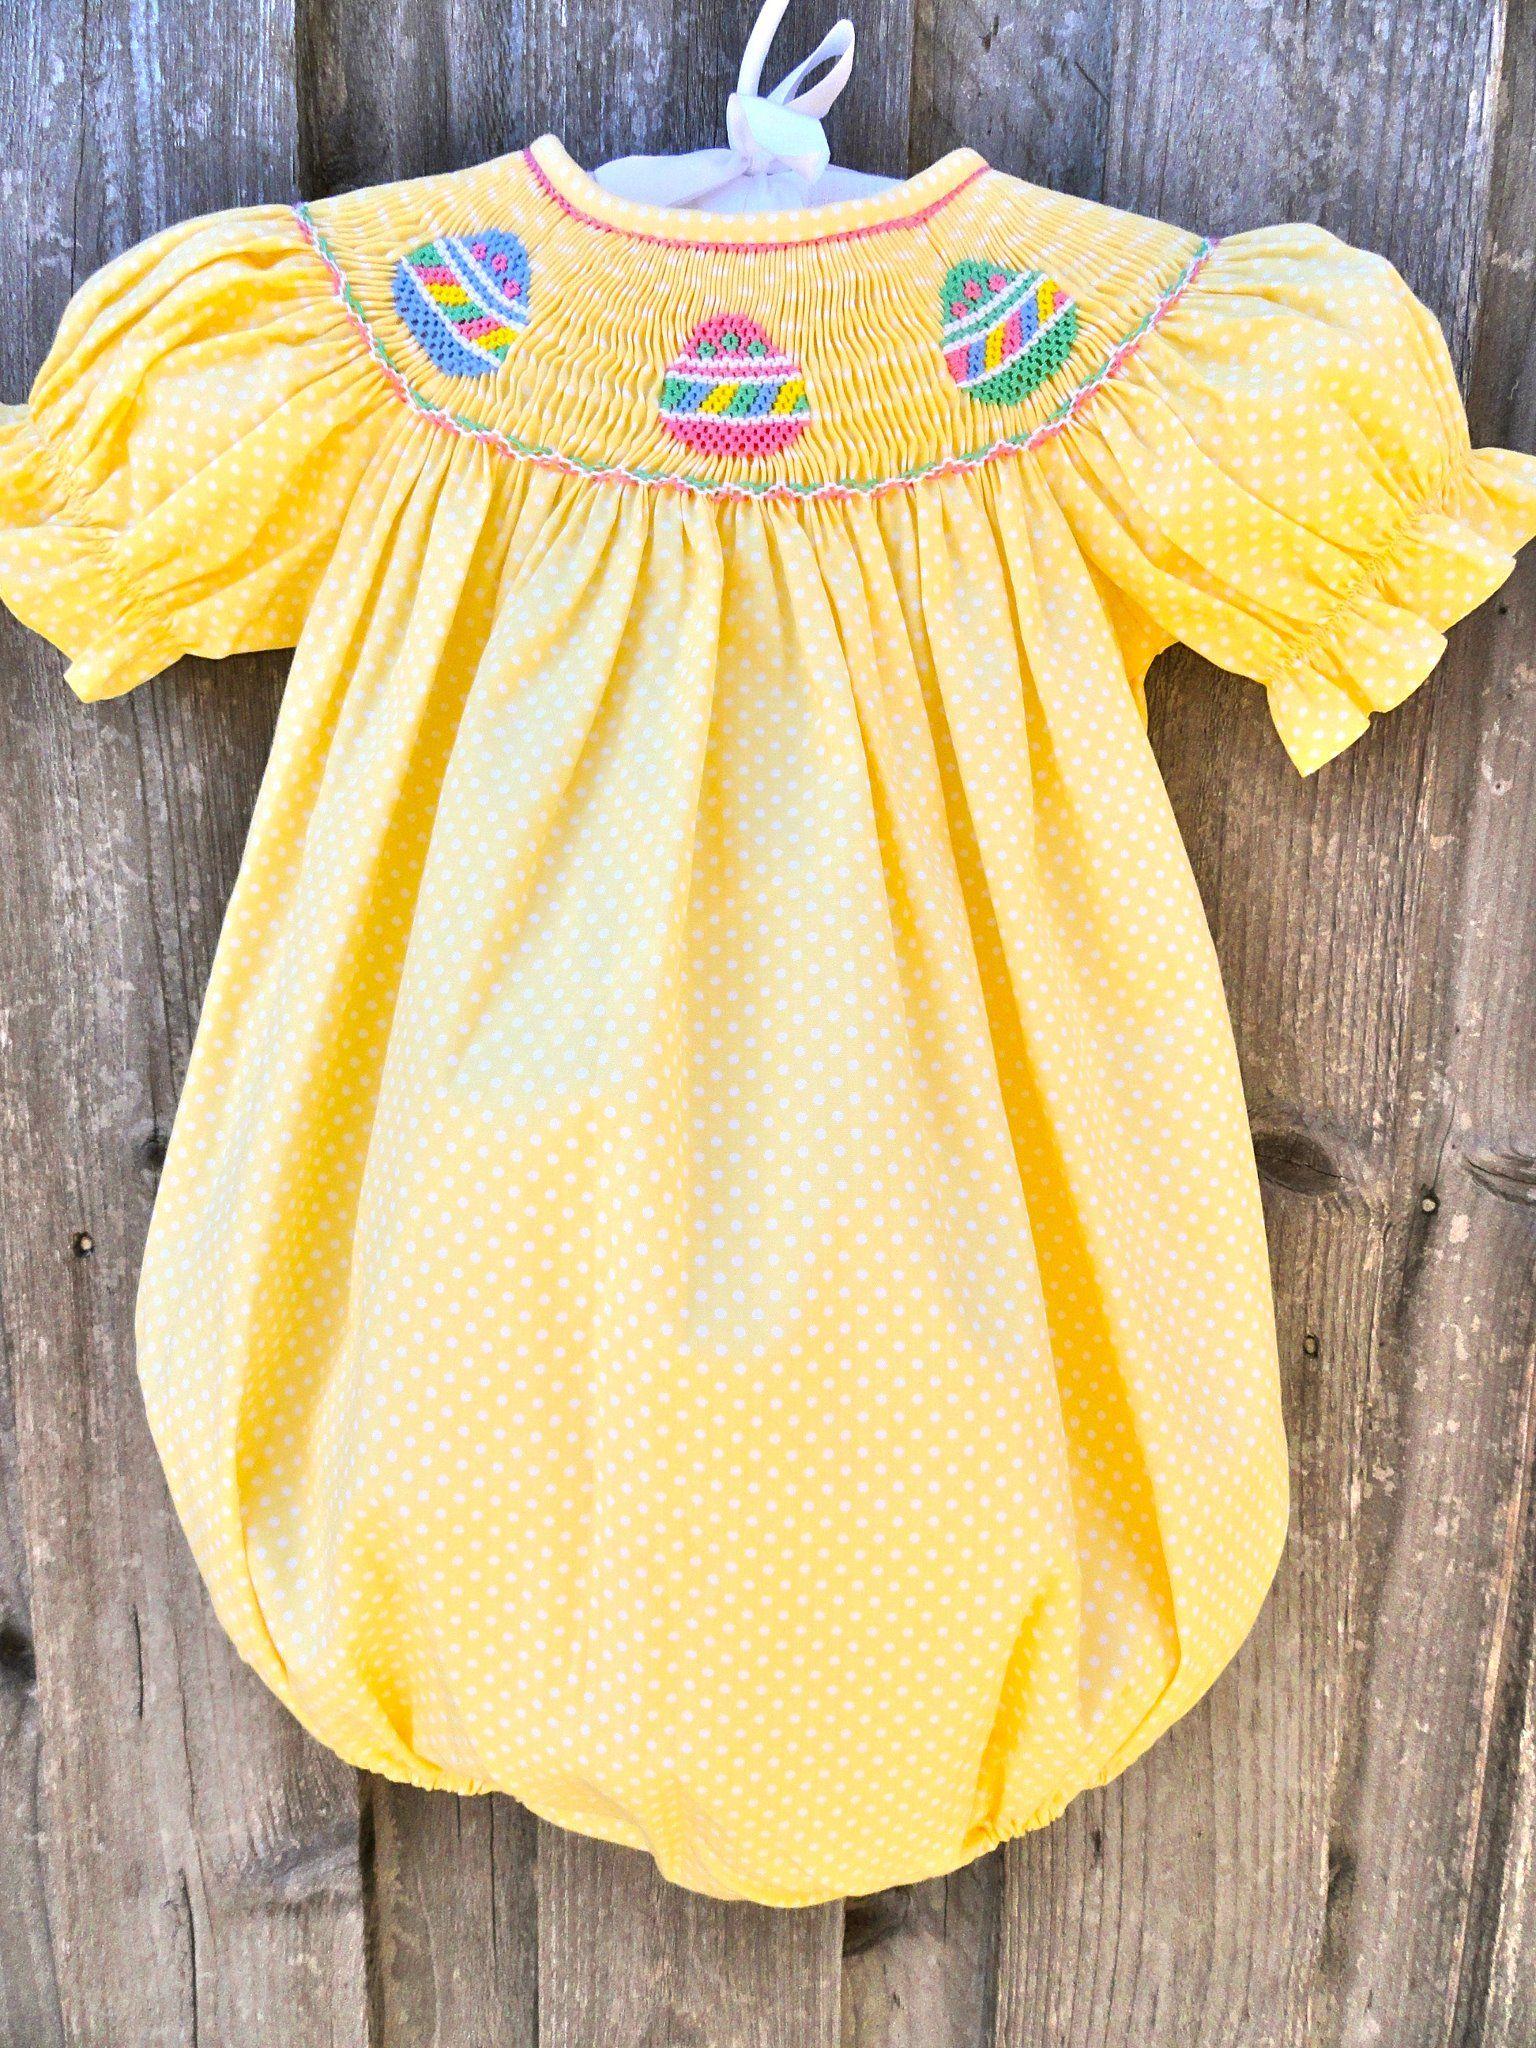 Yellow Polka Dot Smocked Easter Egg Bubble If I had a little girl